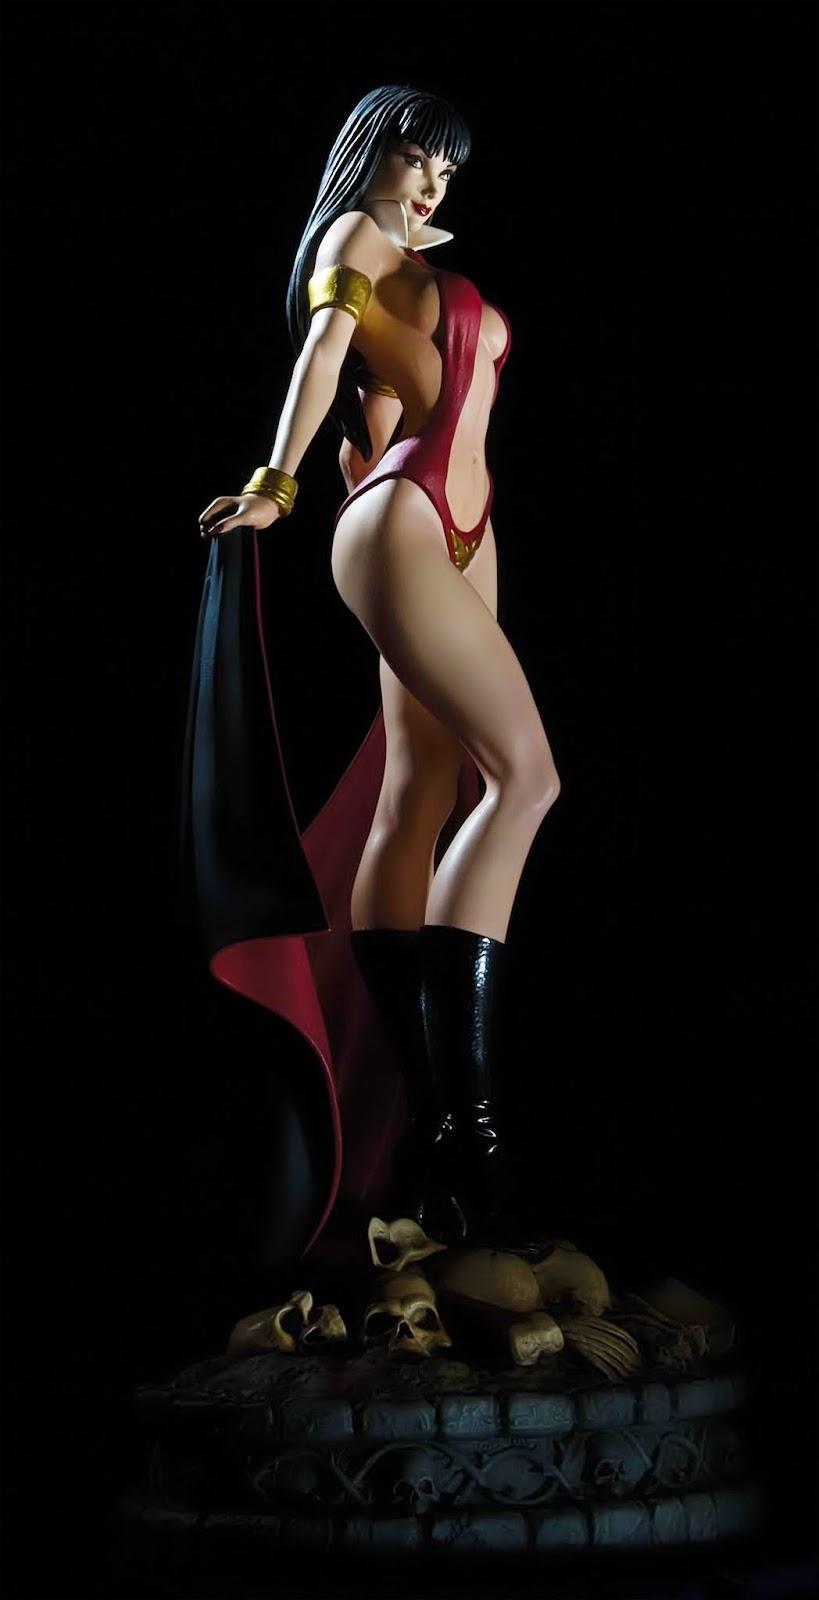 [Dynamite] Woman of Dynamite: Vampirella Statue Vamp_6_dark